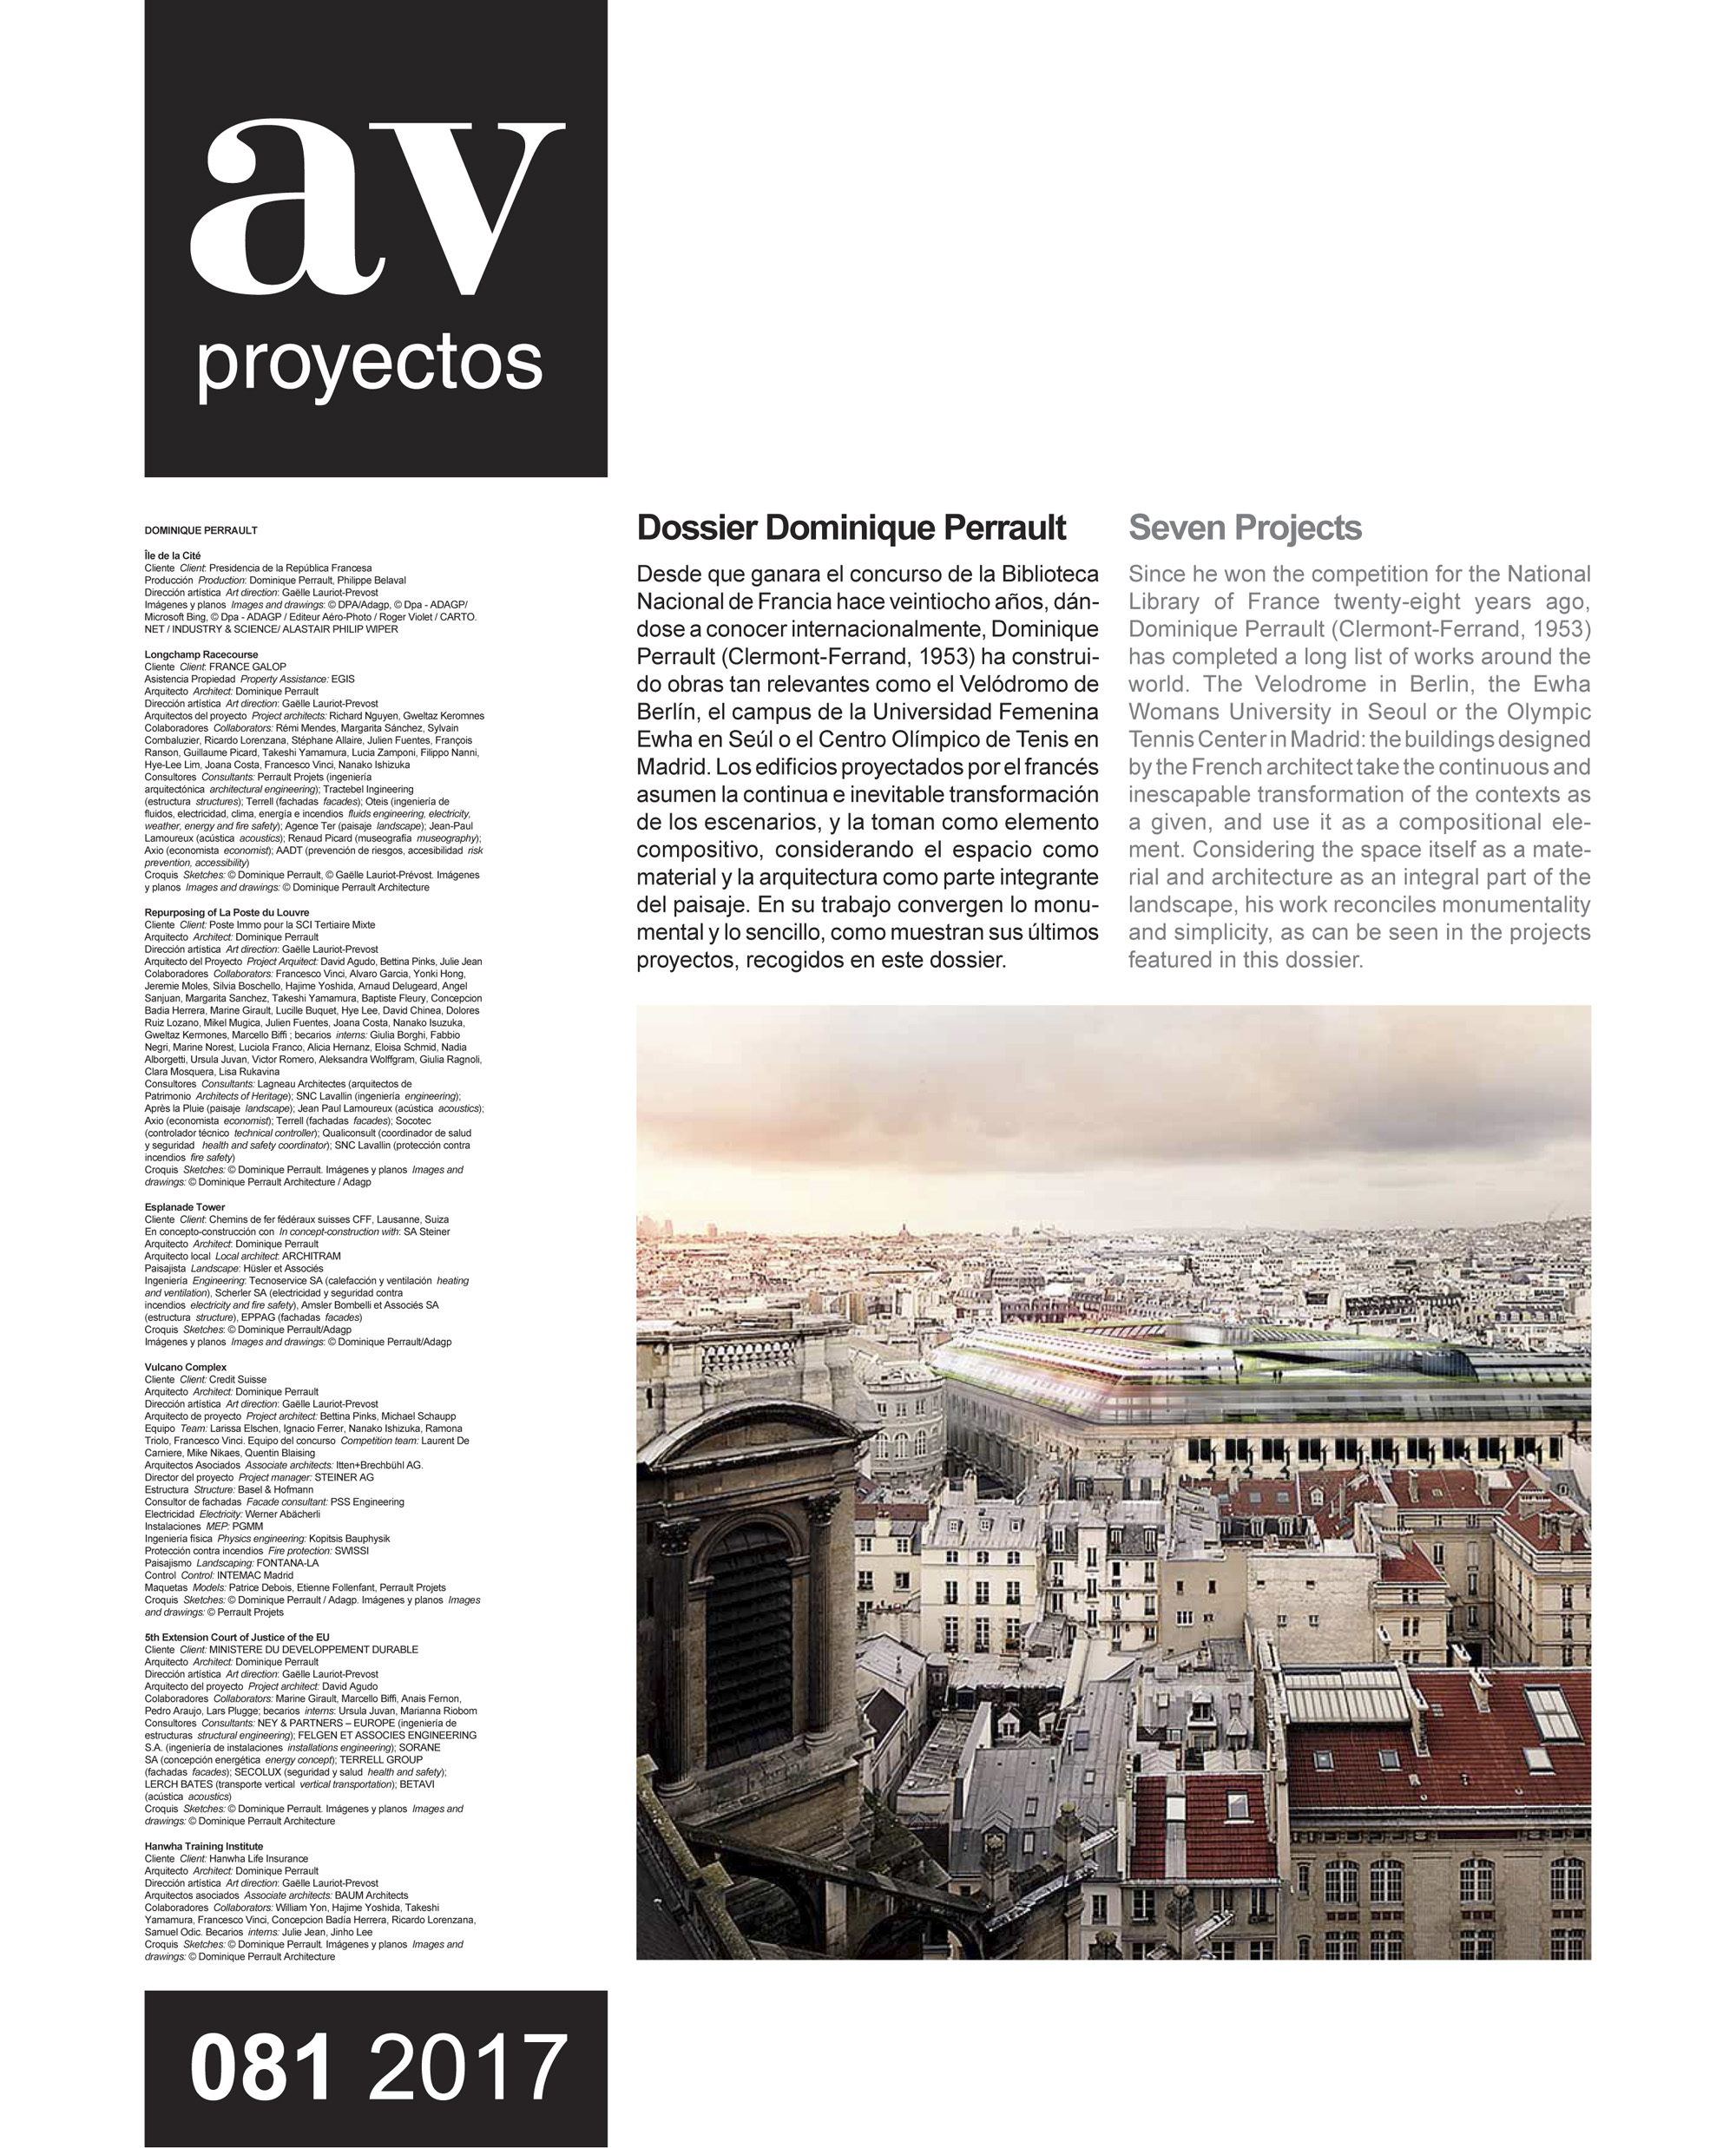 Dossier Dominique Perrault